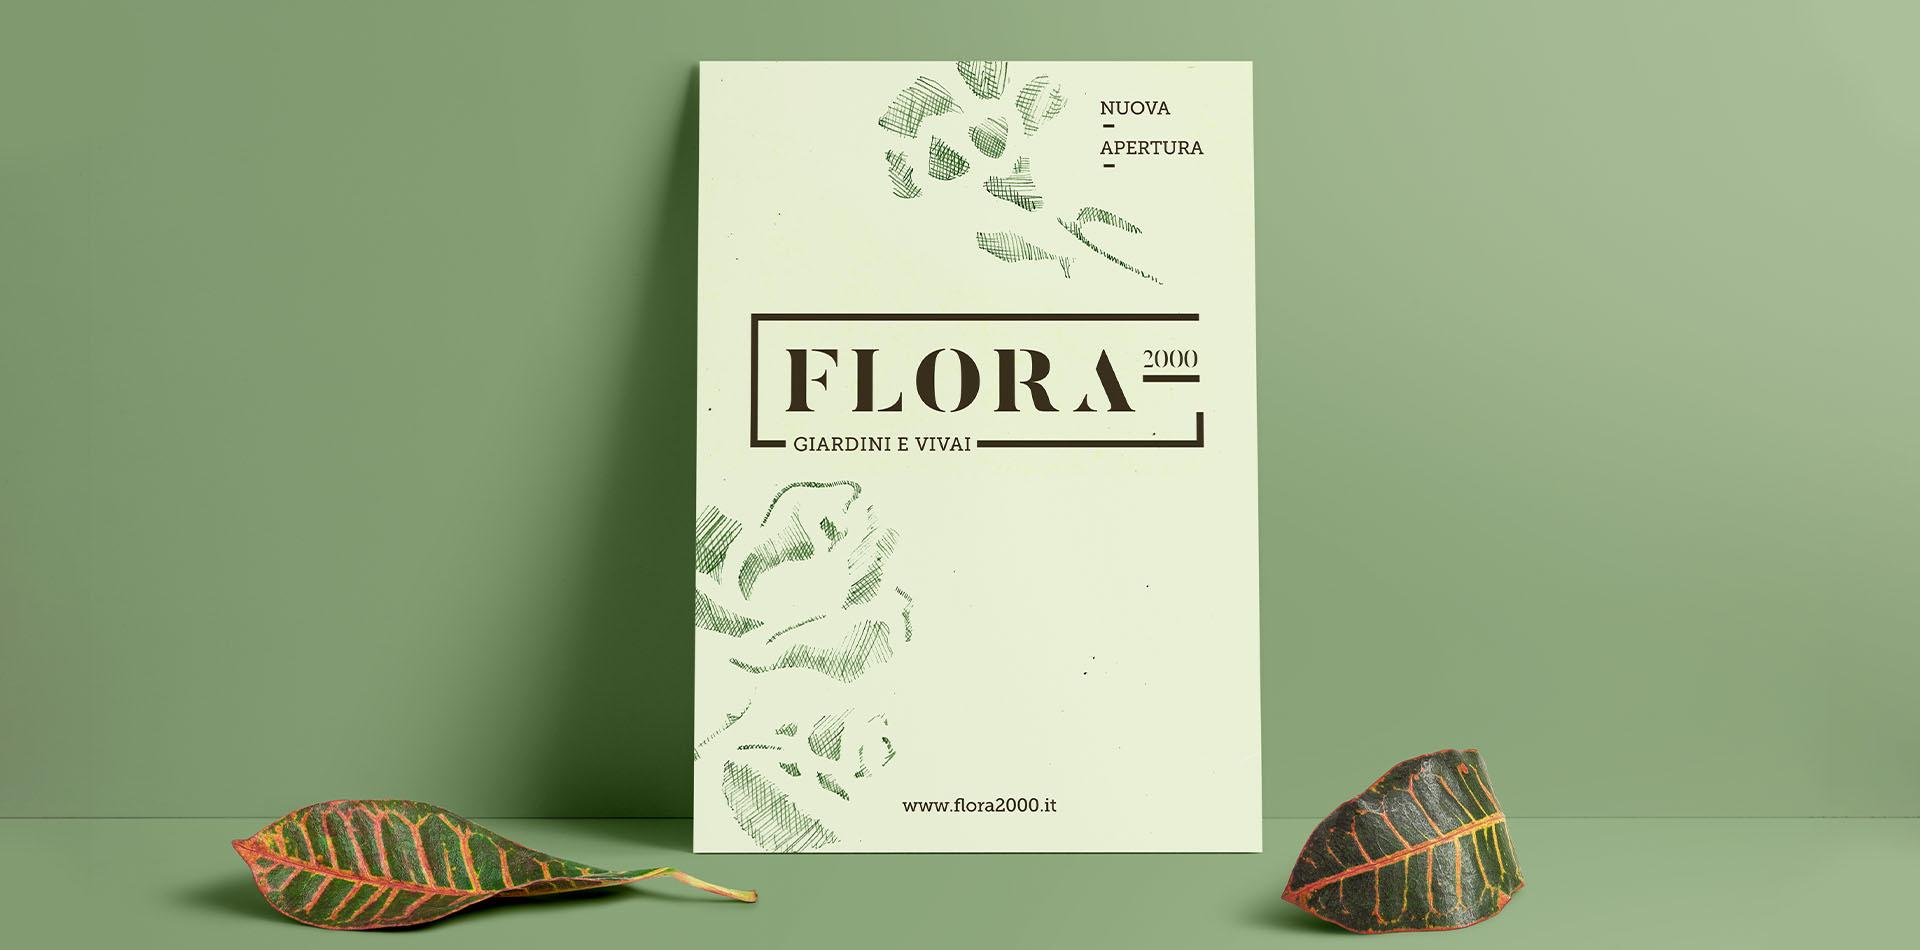 flora 2000 logo poster mockup-big